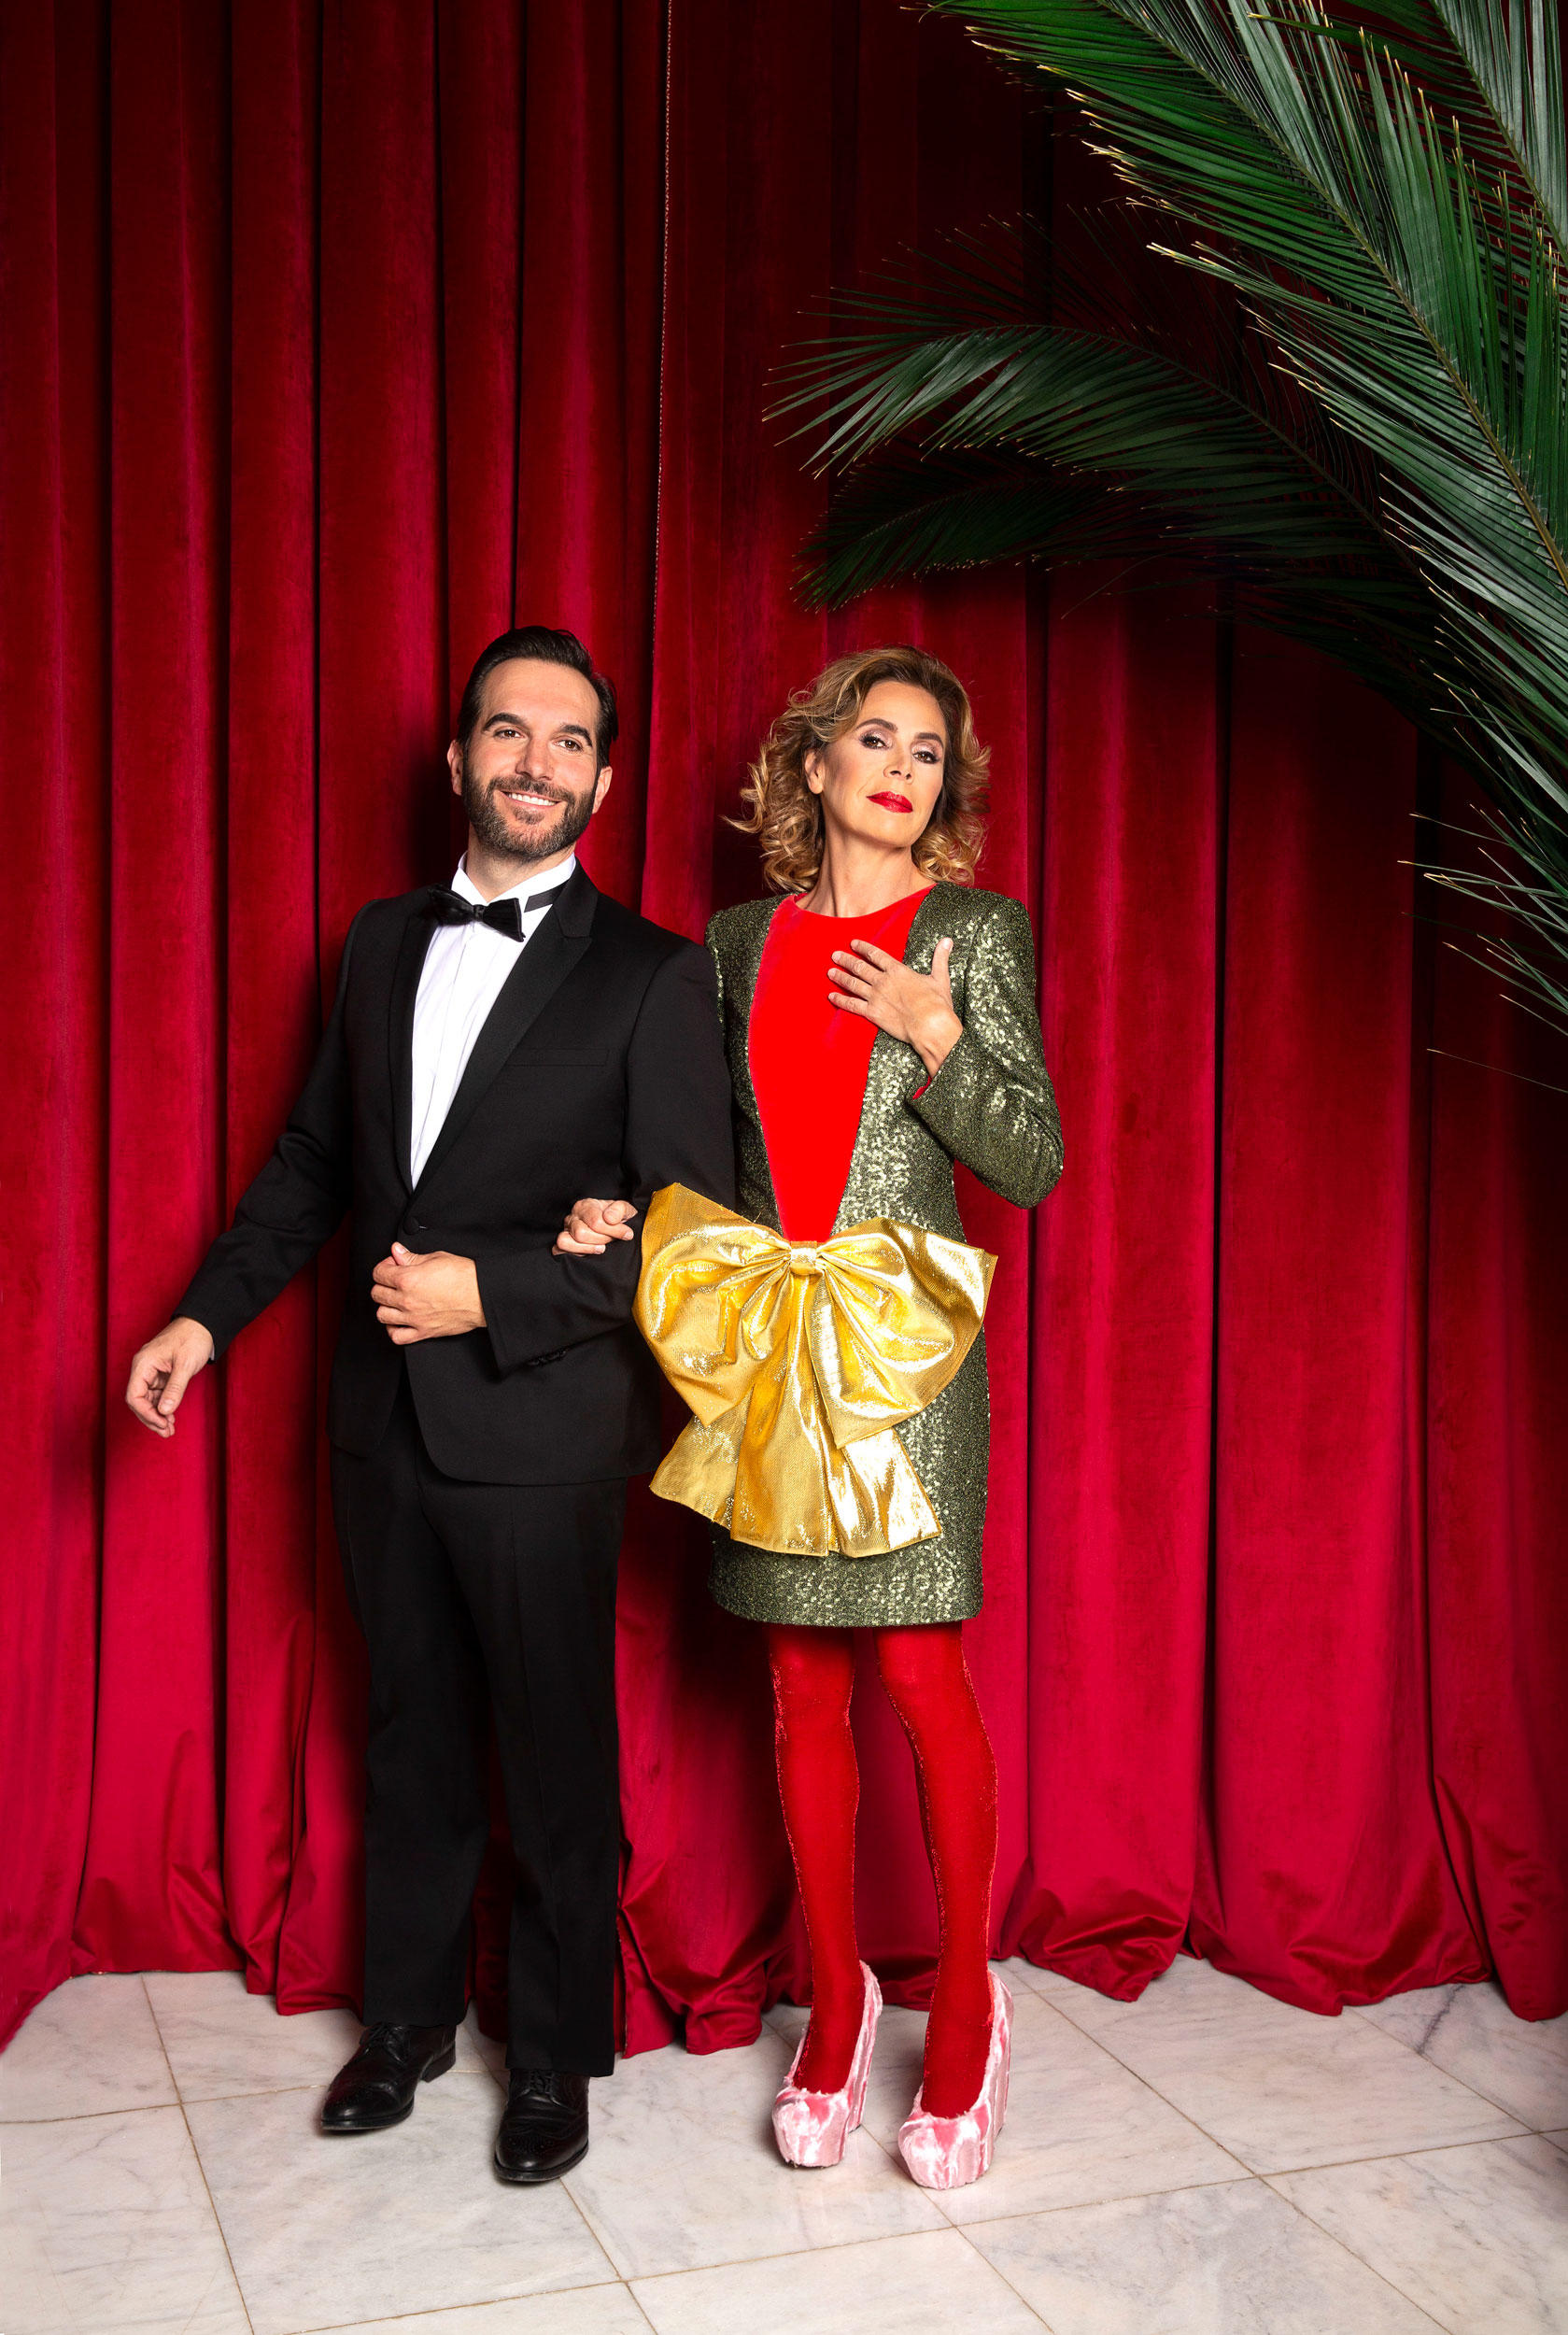 Mario Sandoval junto a Ágatha Ruiz de la Prada. (Foto: Olga Moreno)